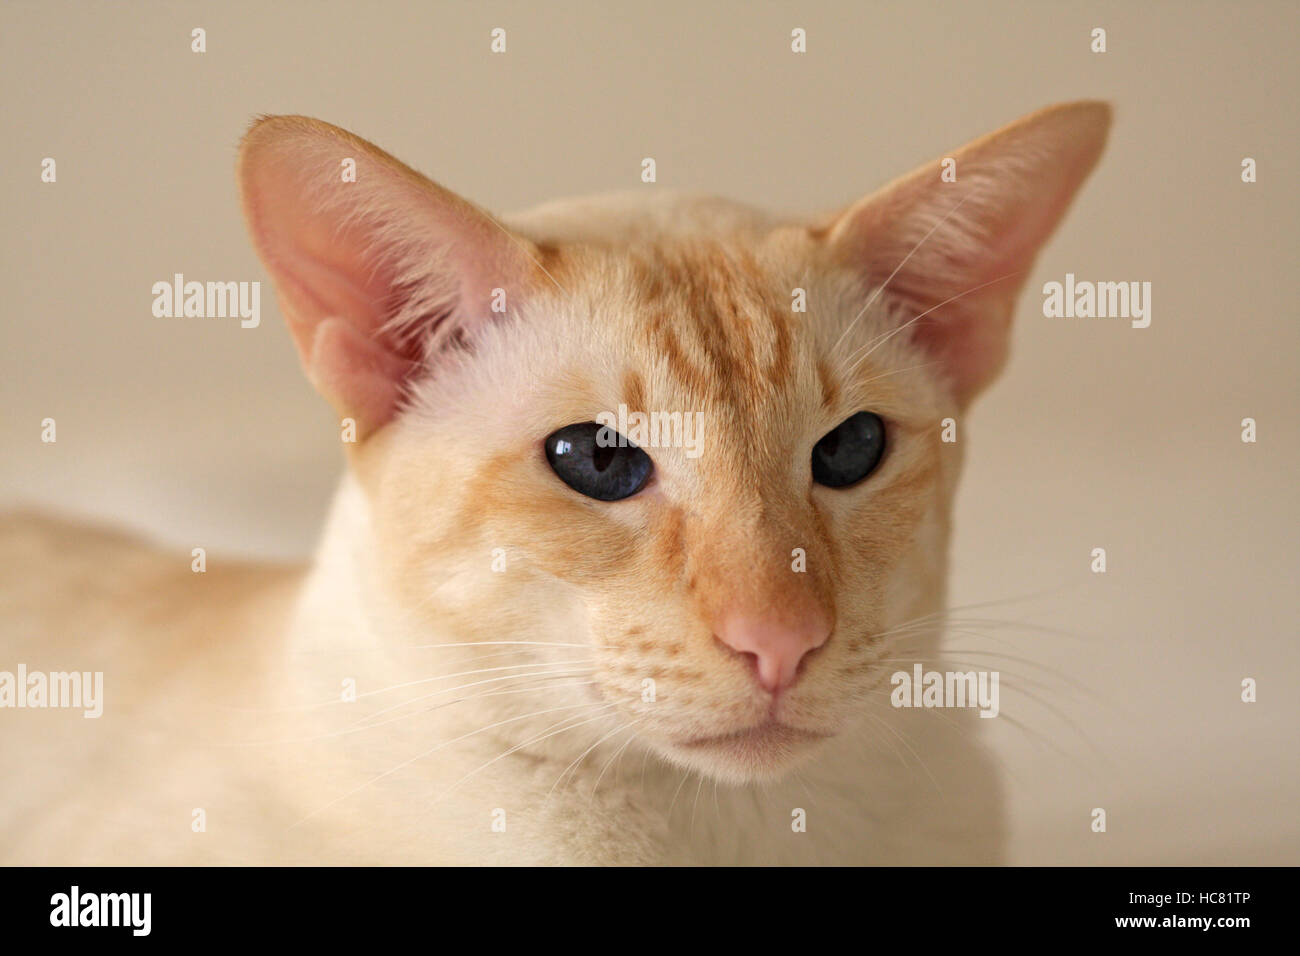 cat gps tracker chip